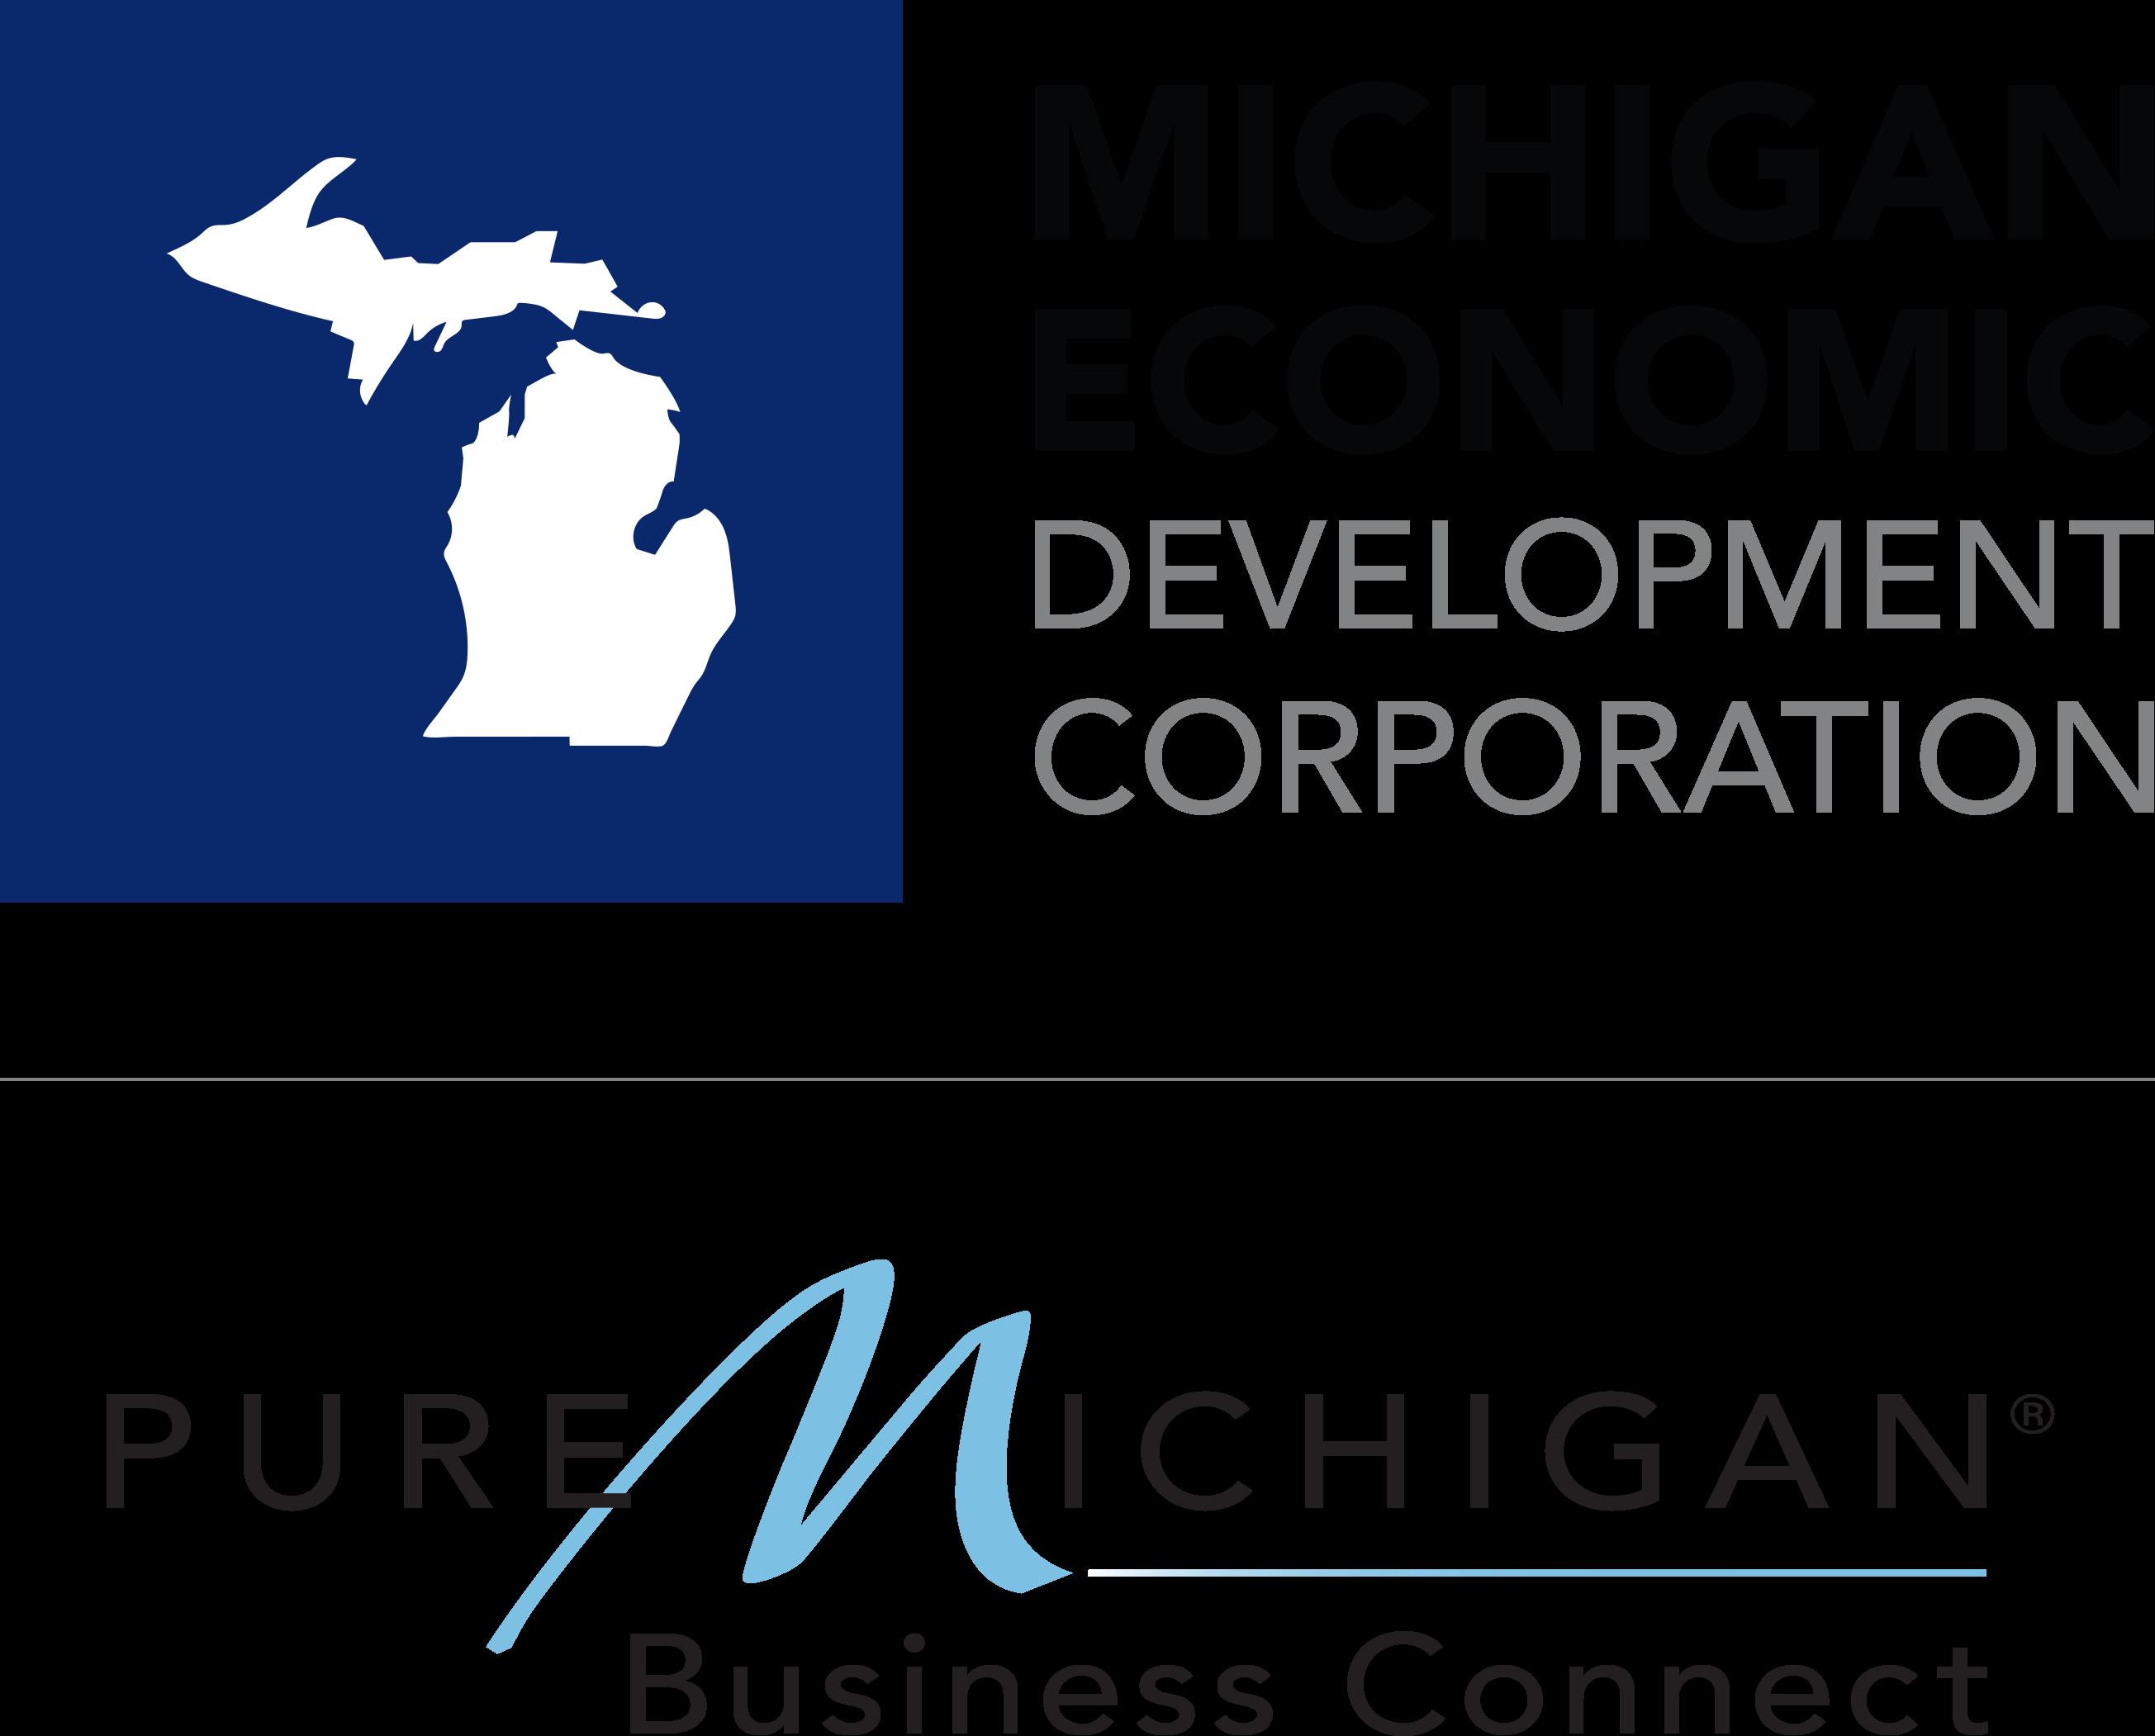 MEDC and PMBC logos